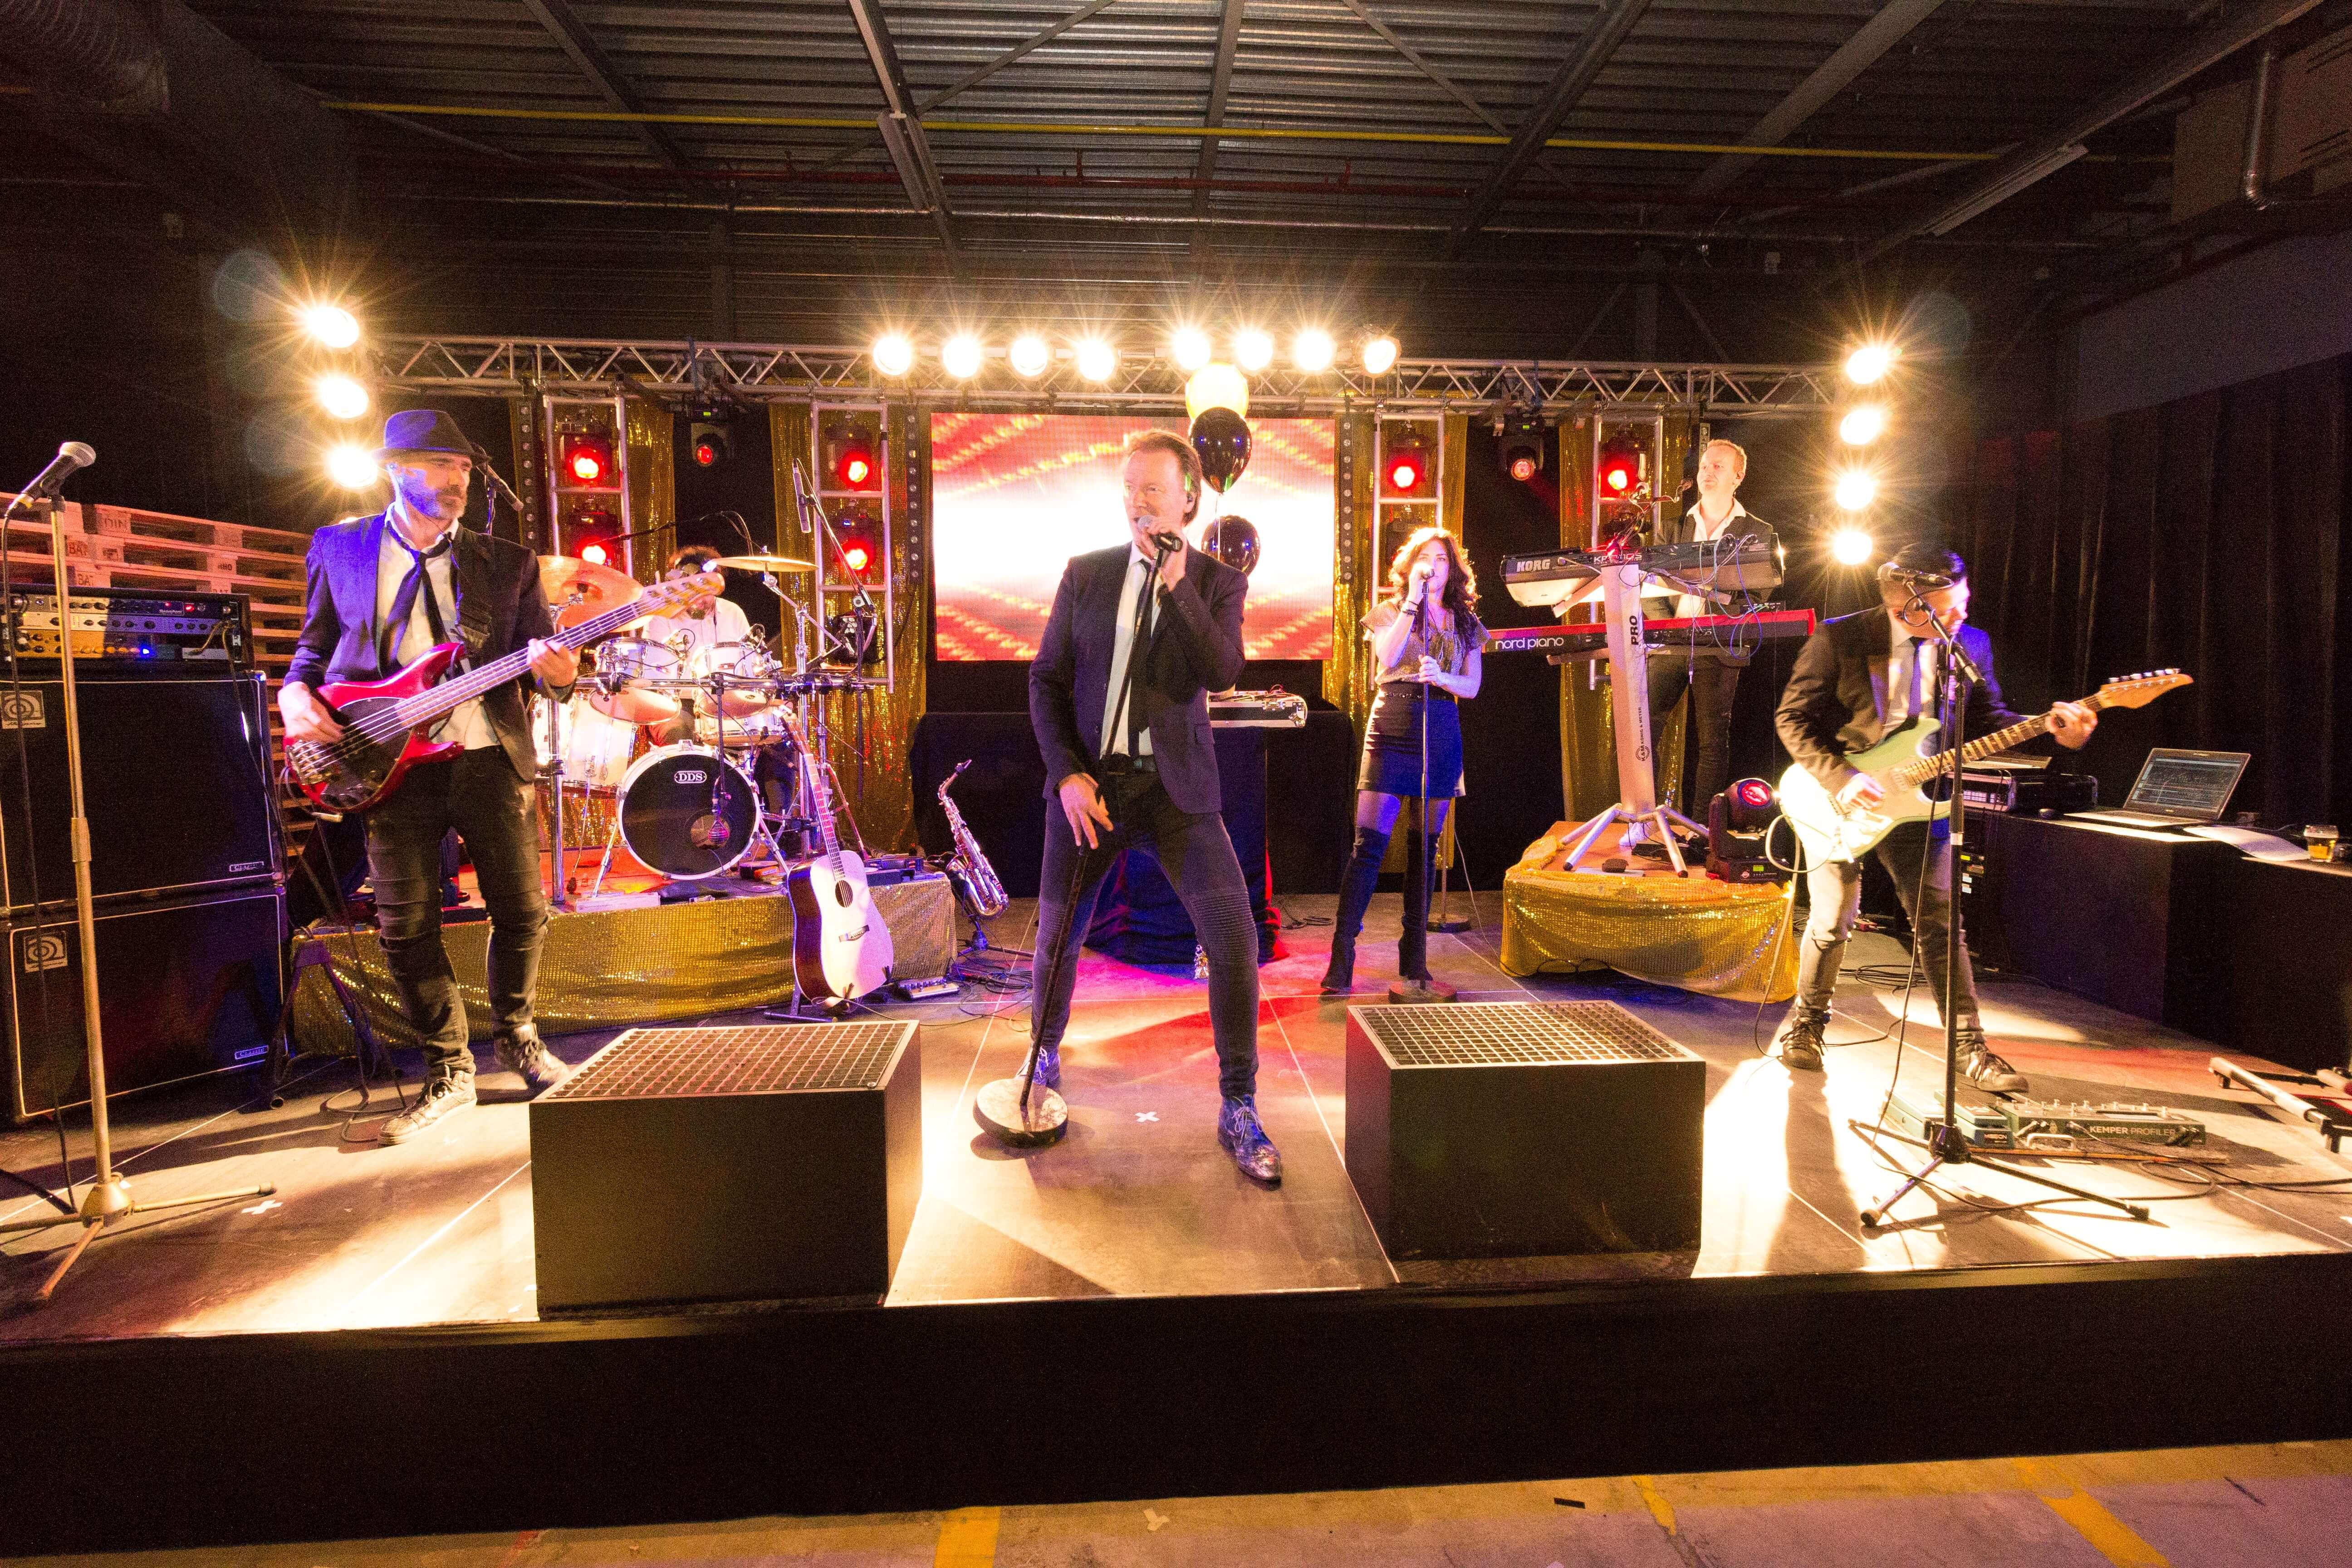 Band treed op bij great gatsby feest van DHL